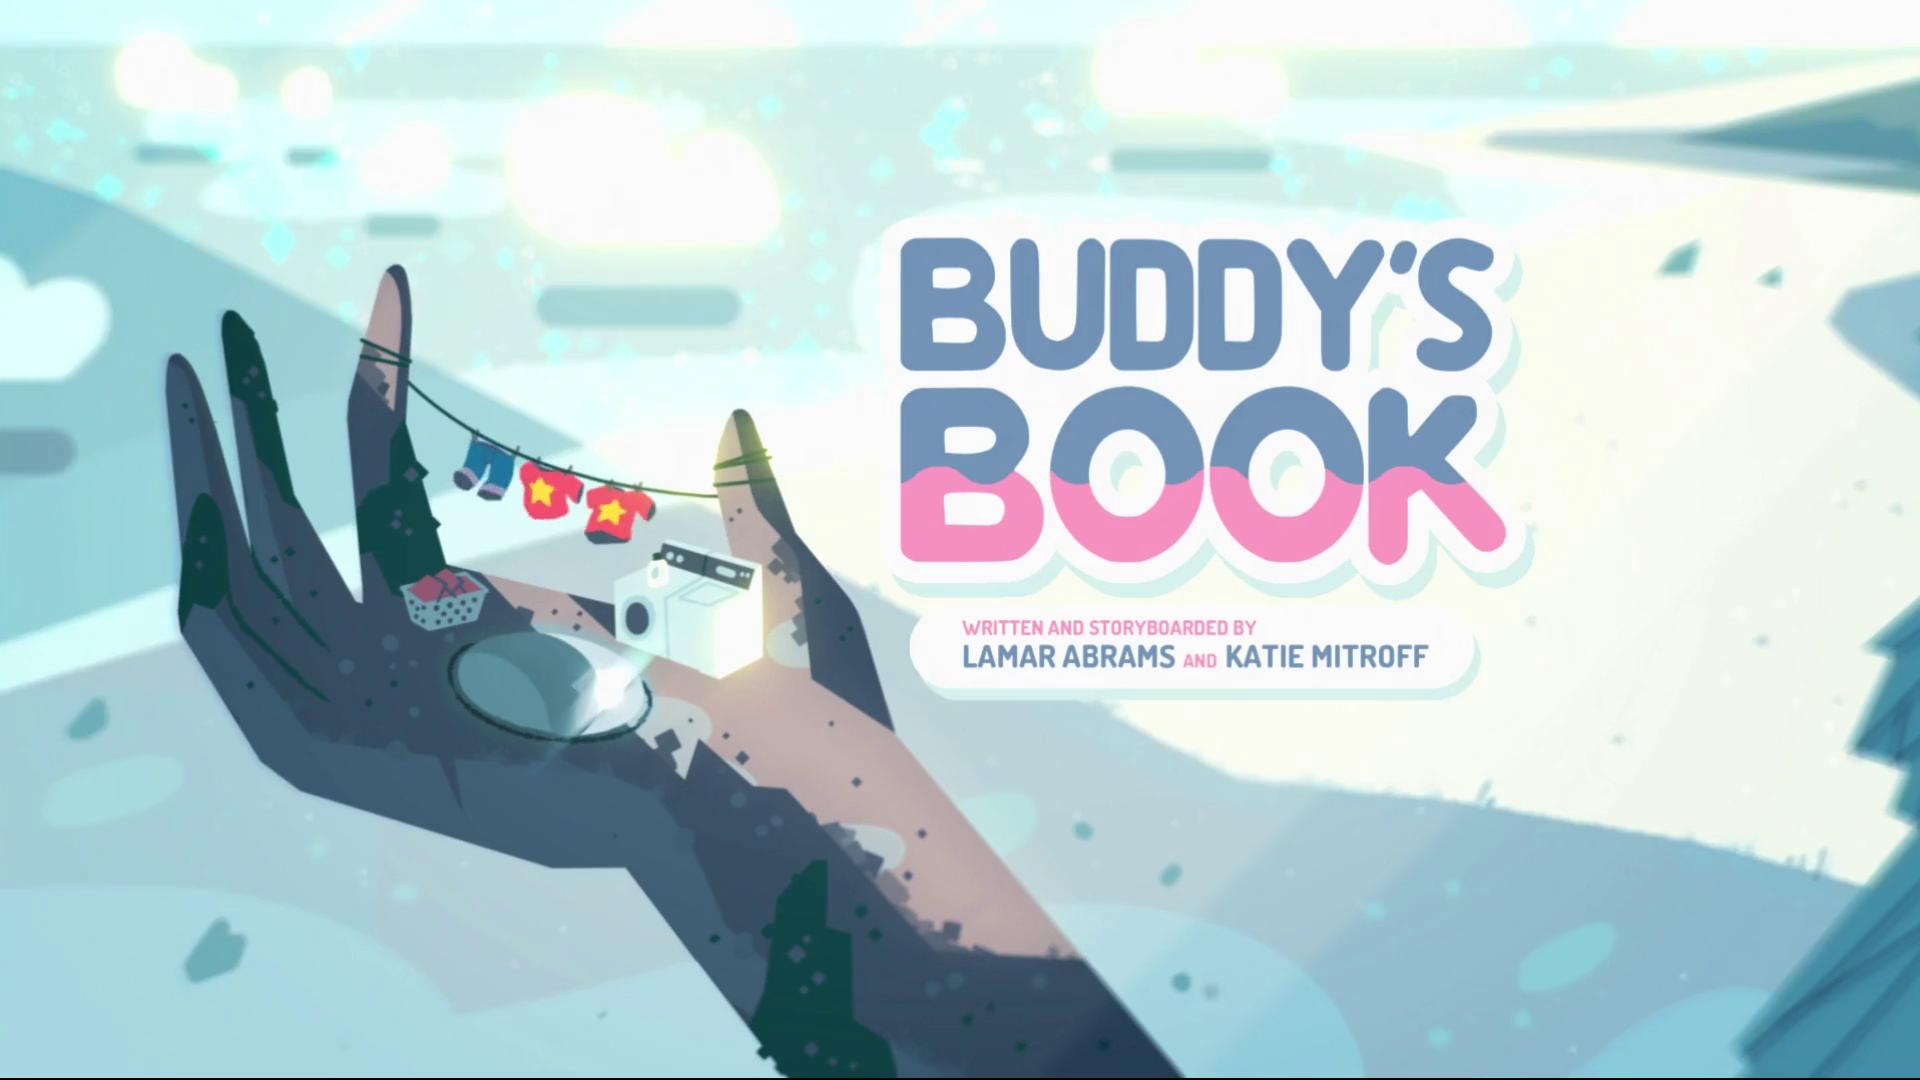 Buddy's Book/Gallery